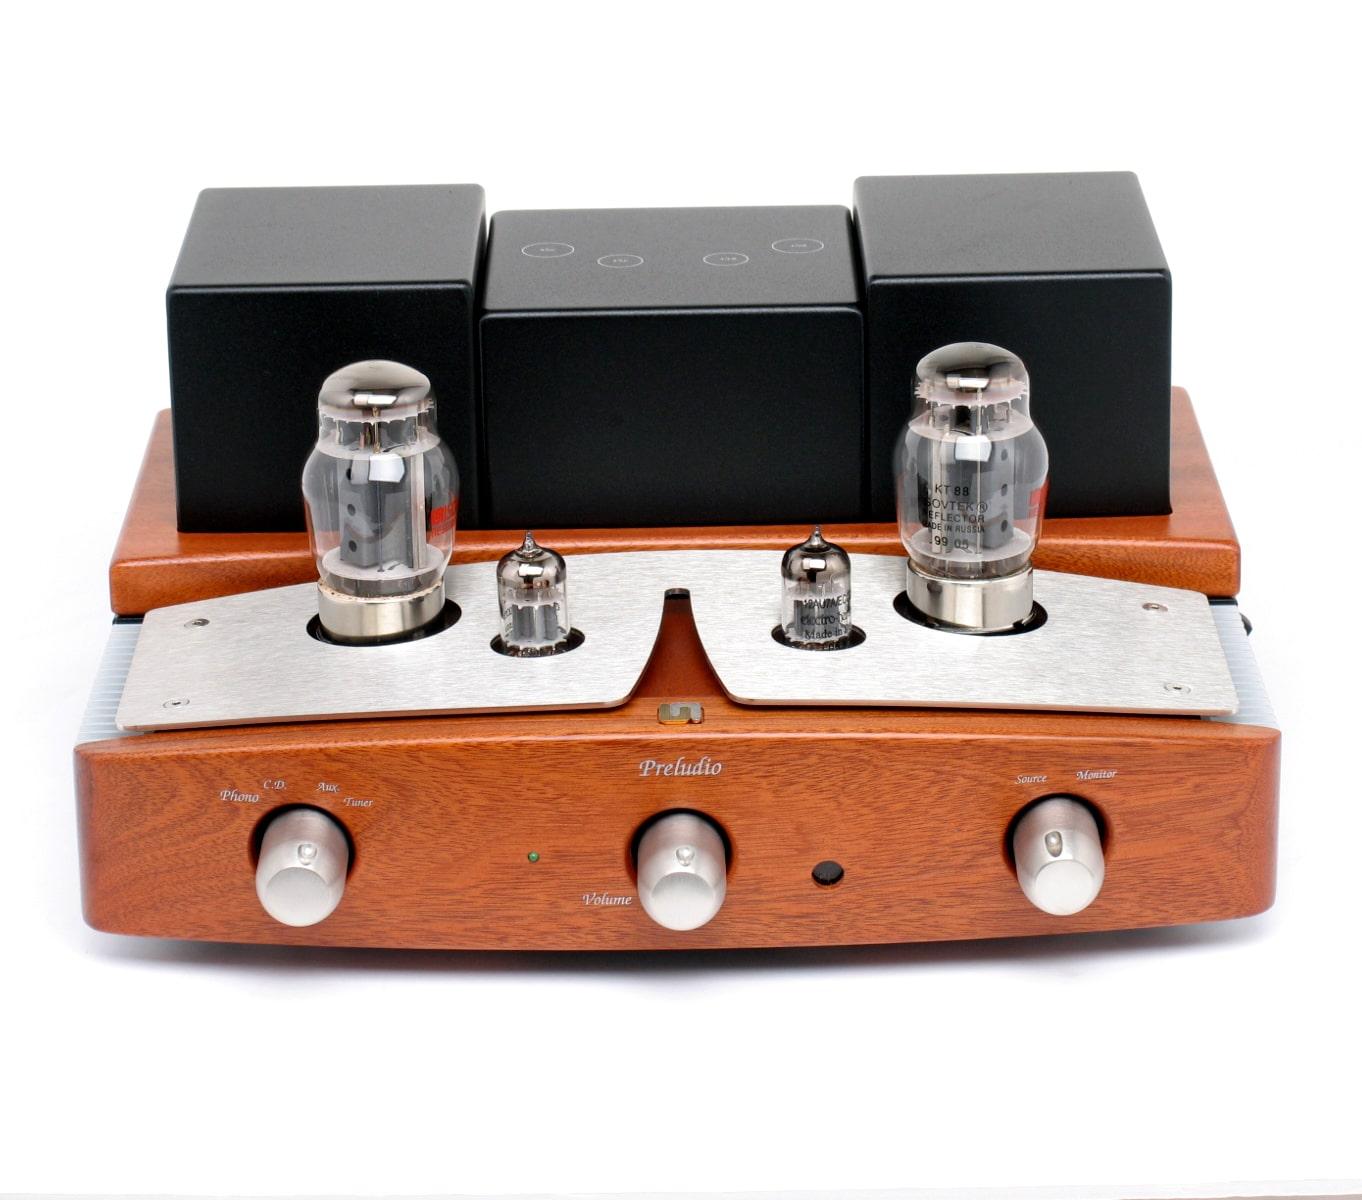 Unison Research Preludio Valve Amplifier